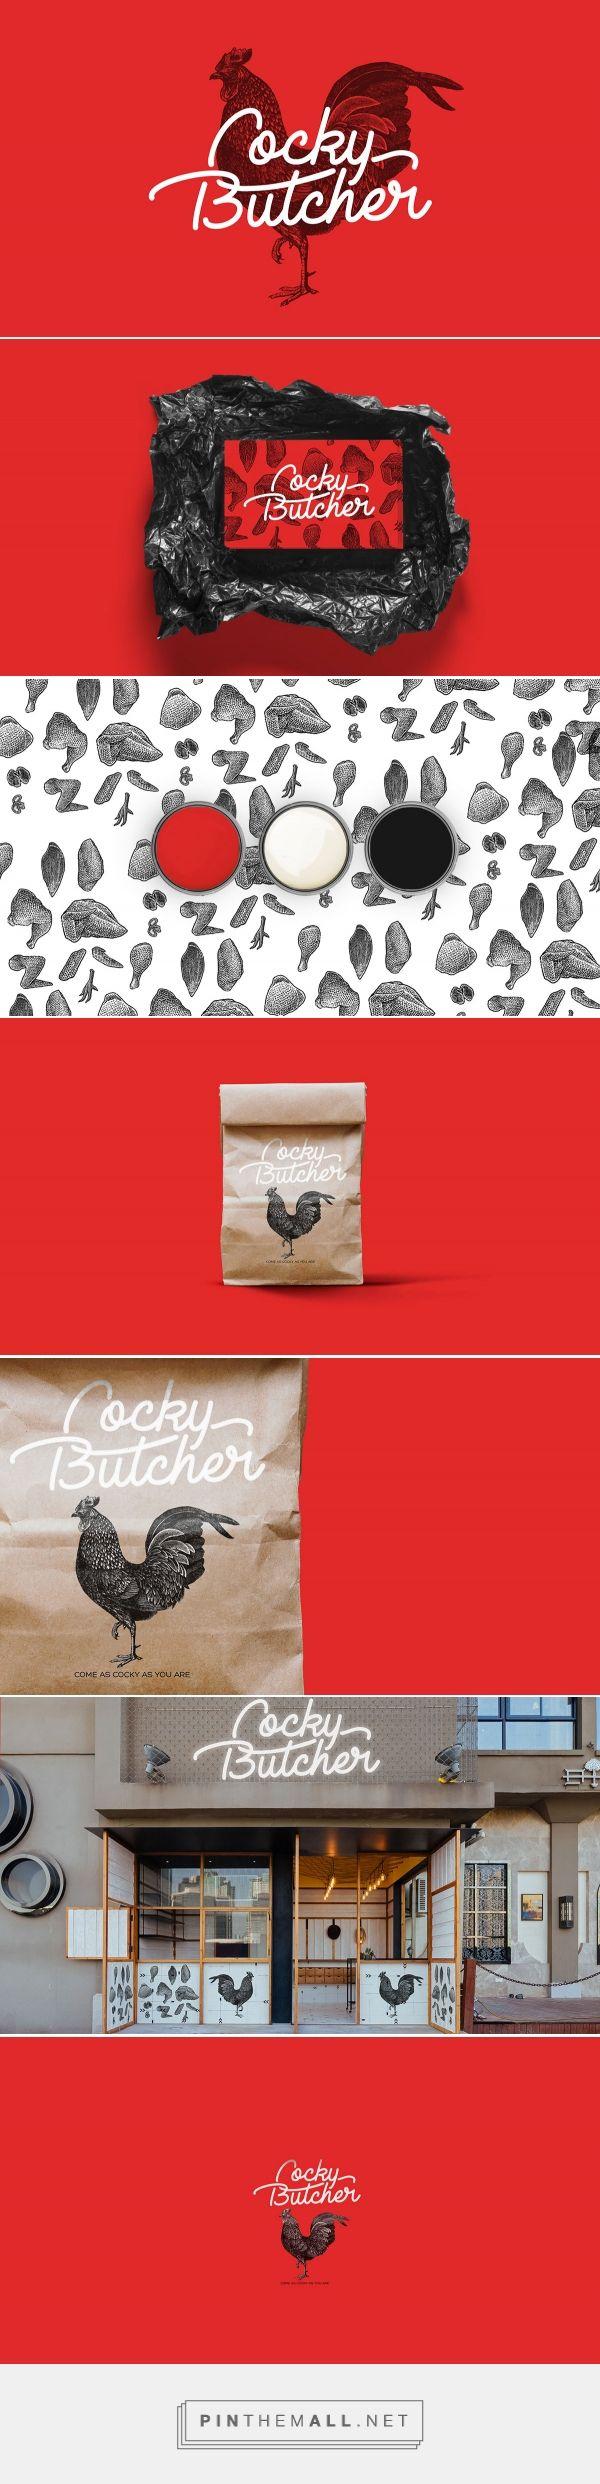 Cocky Butcher Branding by Rudolf Bou Saleh | Fivestar Branding Agency – Design and Branding Agency & Curated Inspiration Gallery #branding #brandidentity #restaurantdesign #design #designinspiration